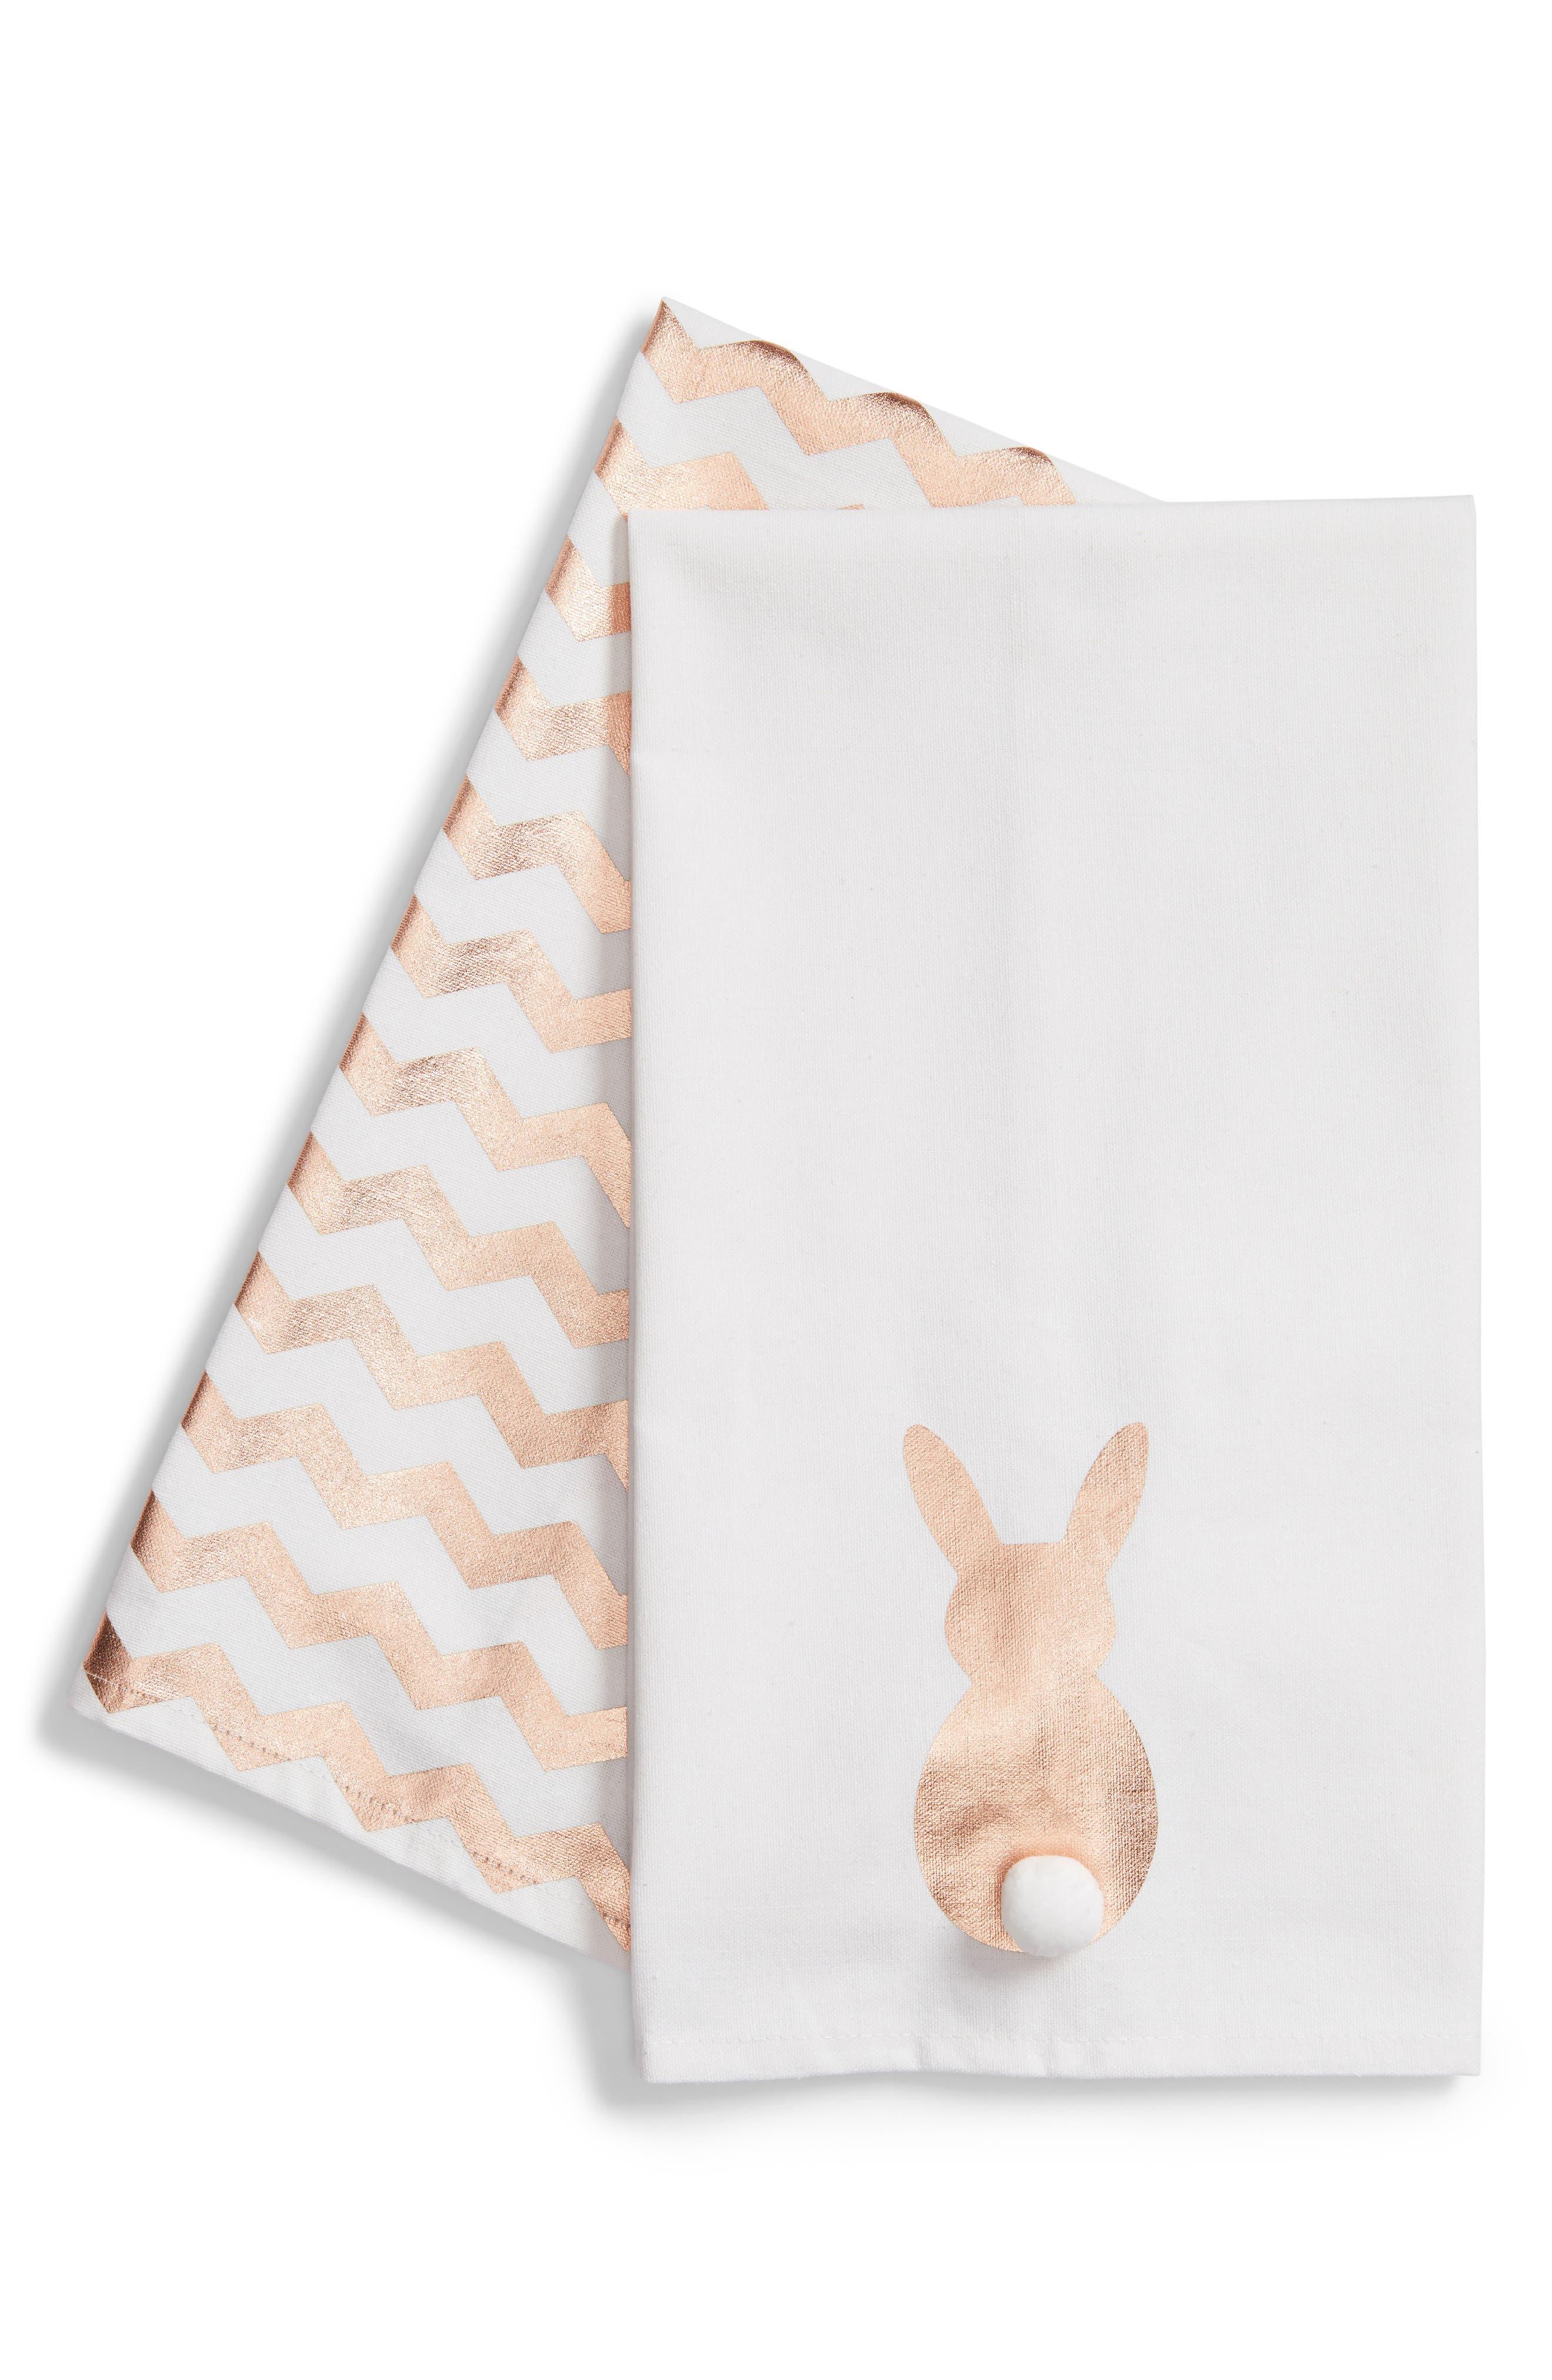 Main Image - Levtex Bunny Set of 2 Dishtowels